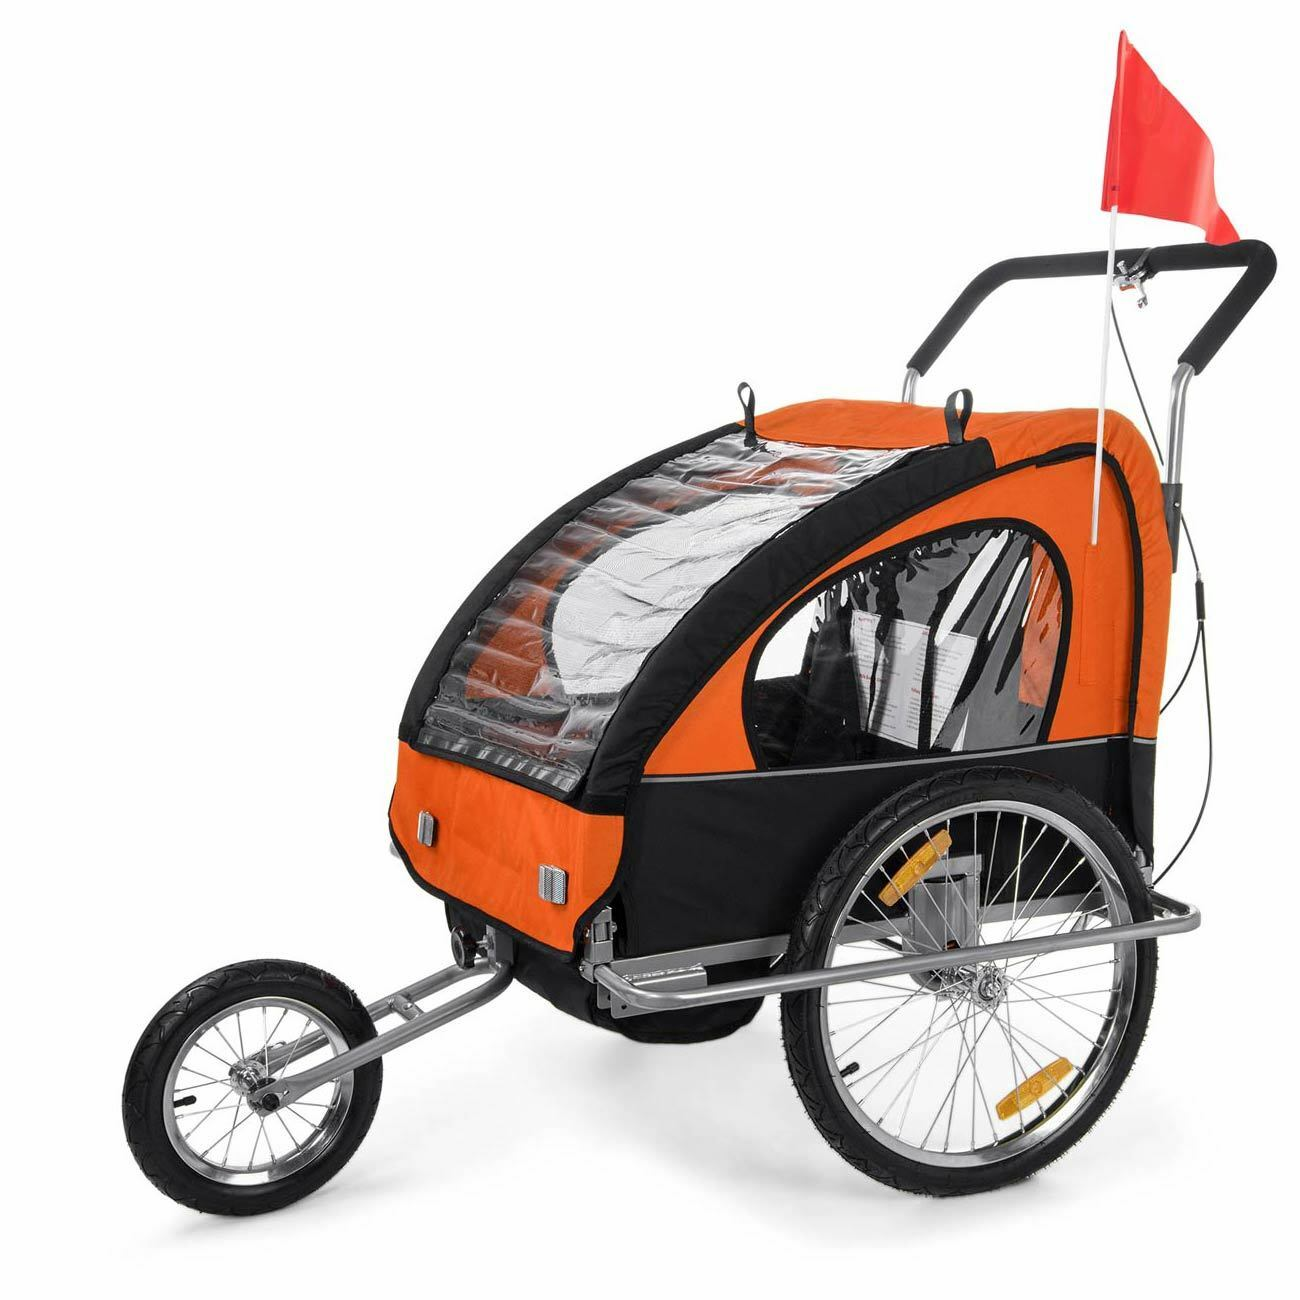 Remolque de Bicicleta para Niños Transportín Silla Cochecito Orange noir SAMAX